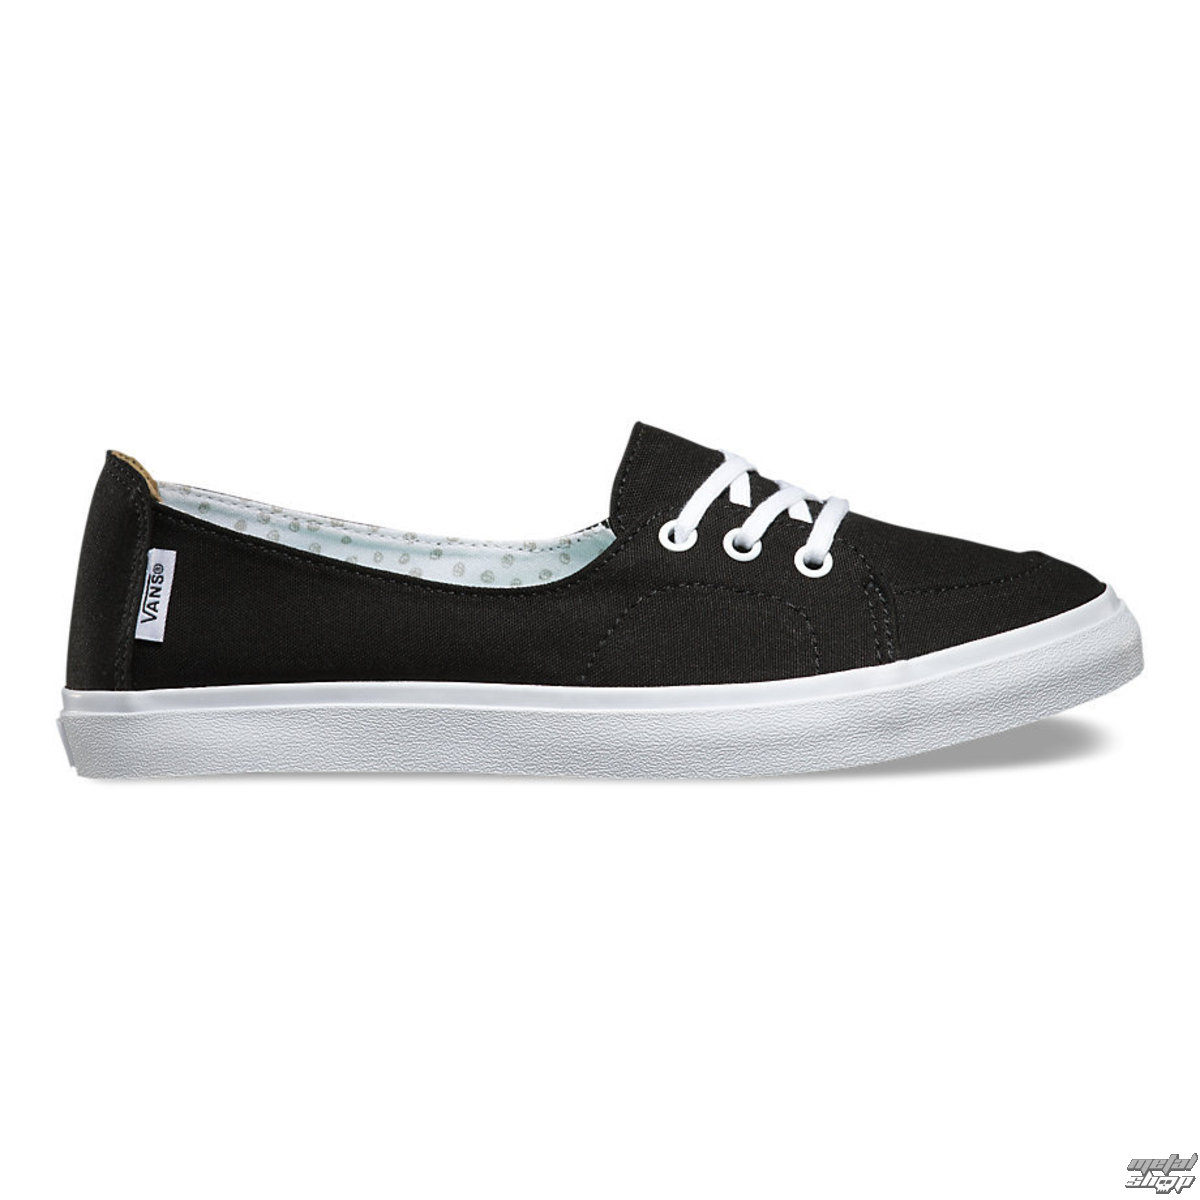 Damen Schuhe VANS Palisades SF Dots Black